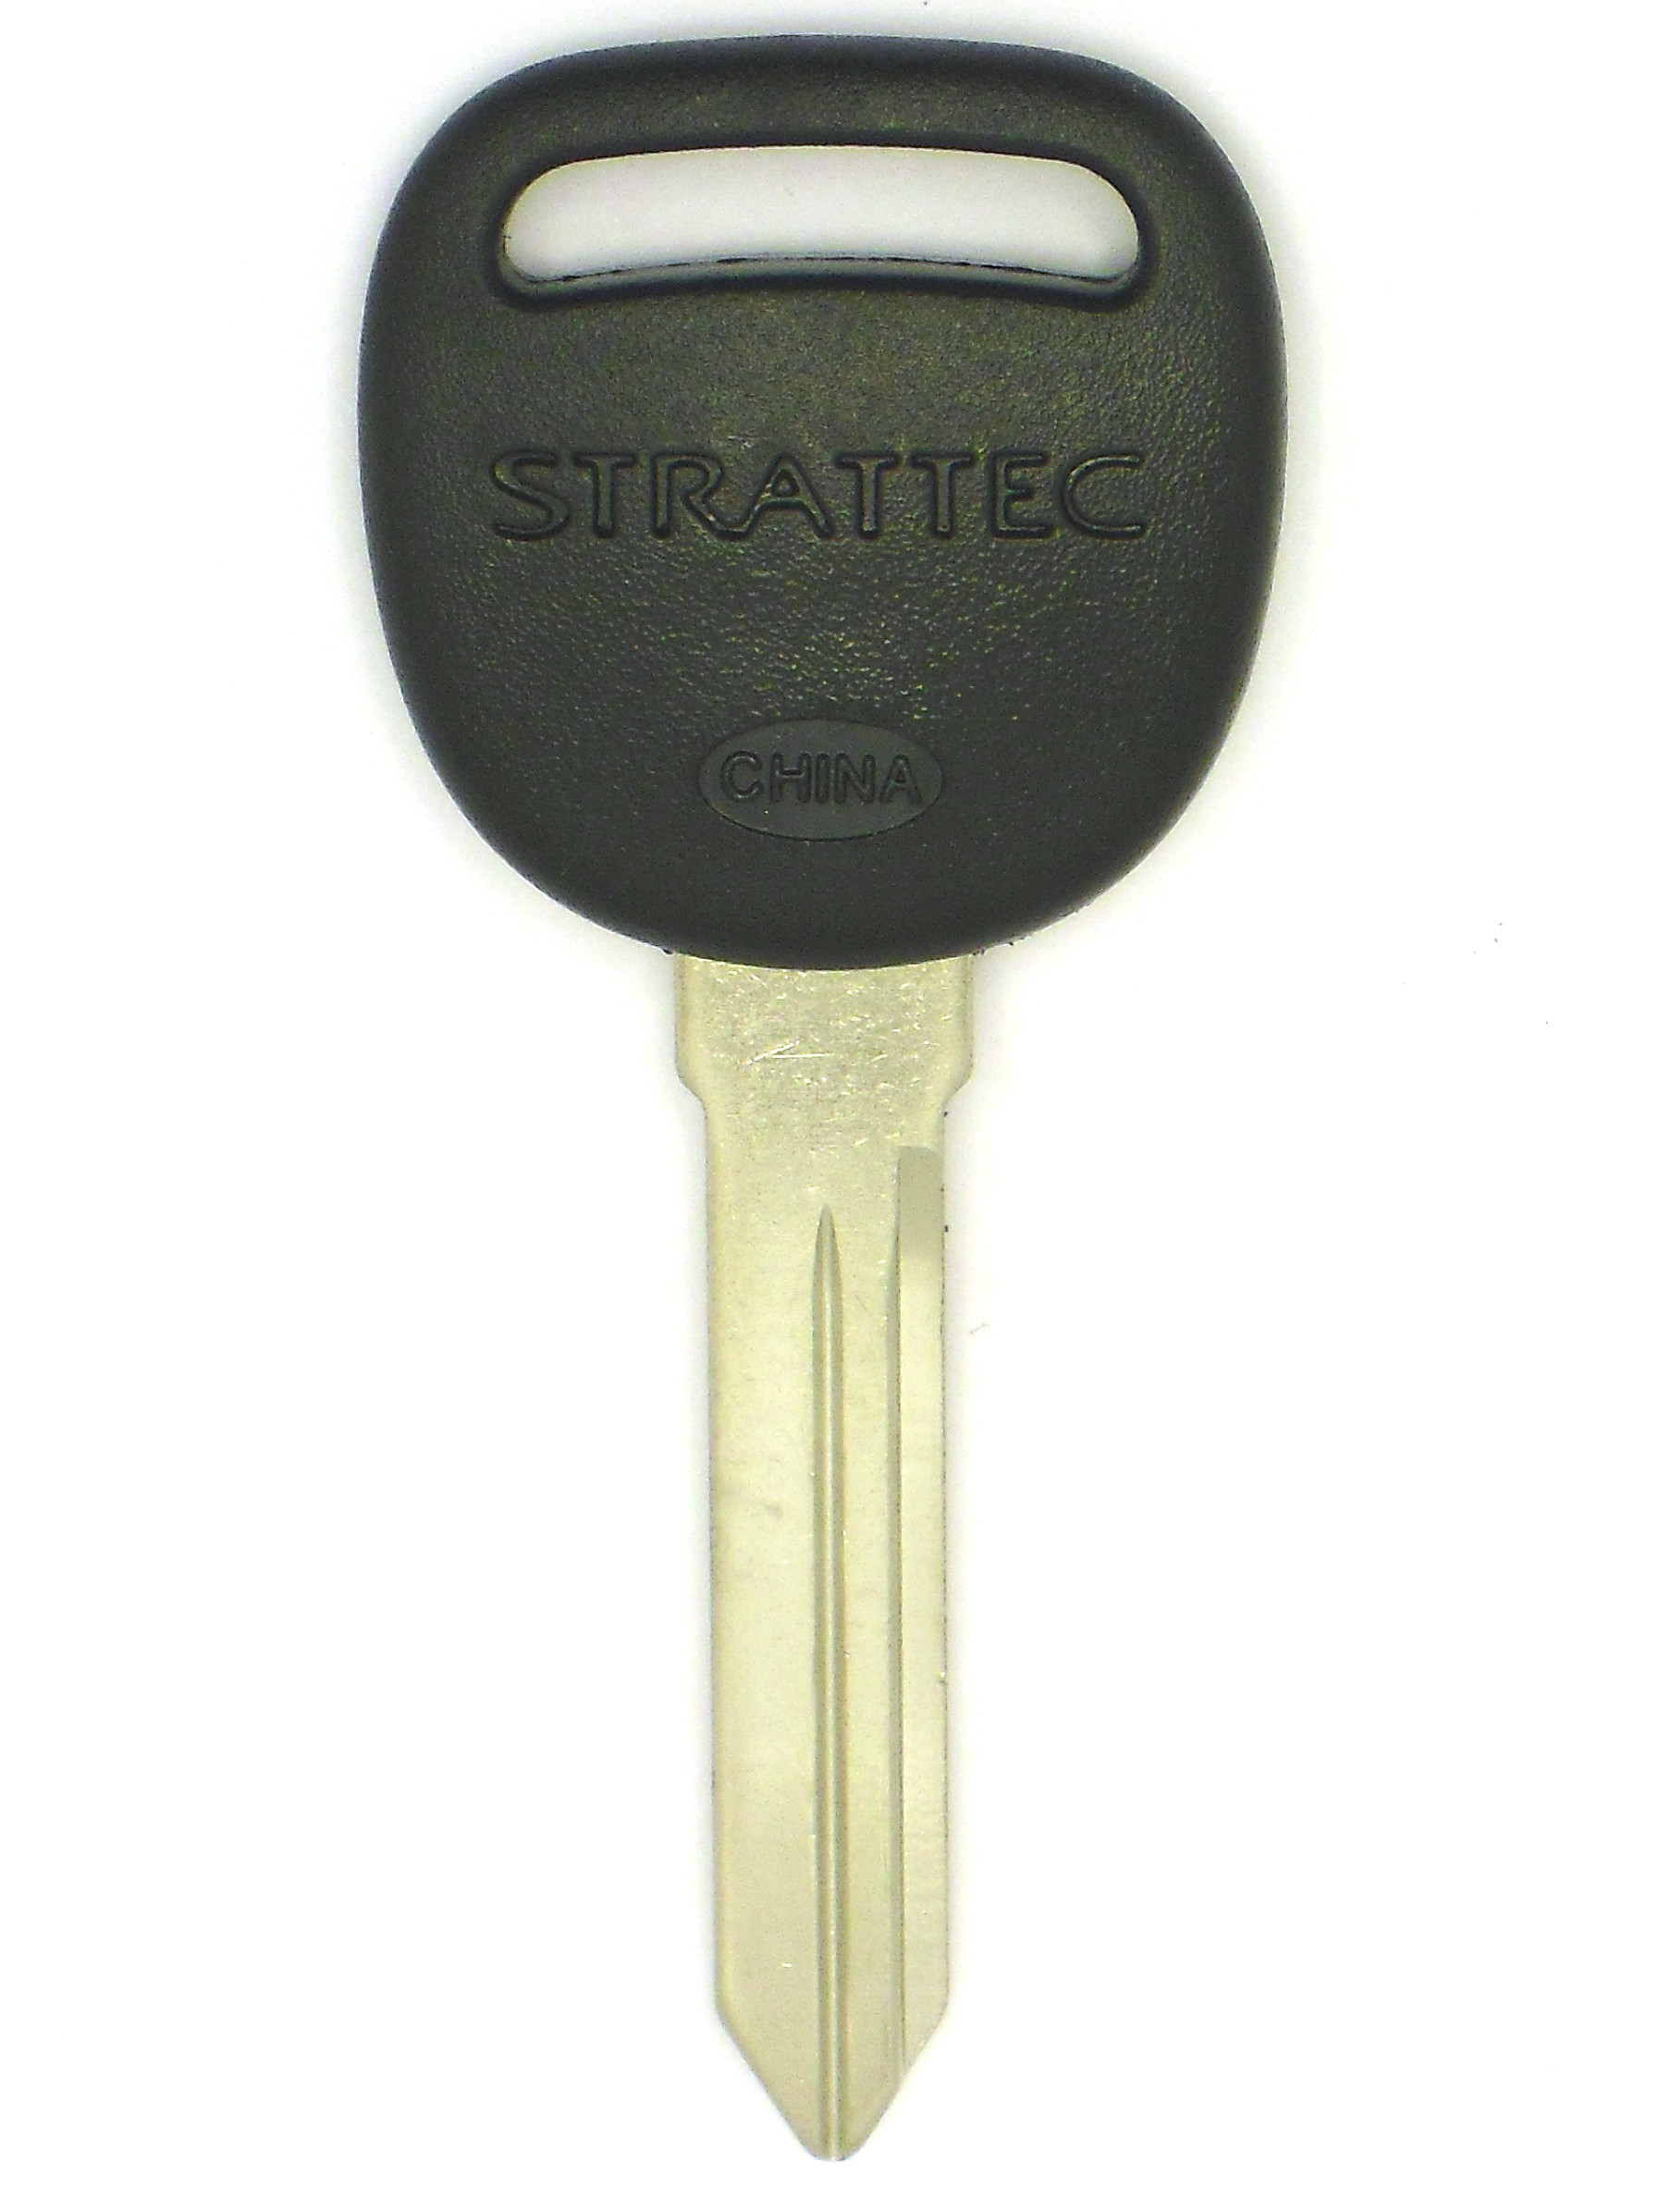 GM Non-Transponder Key